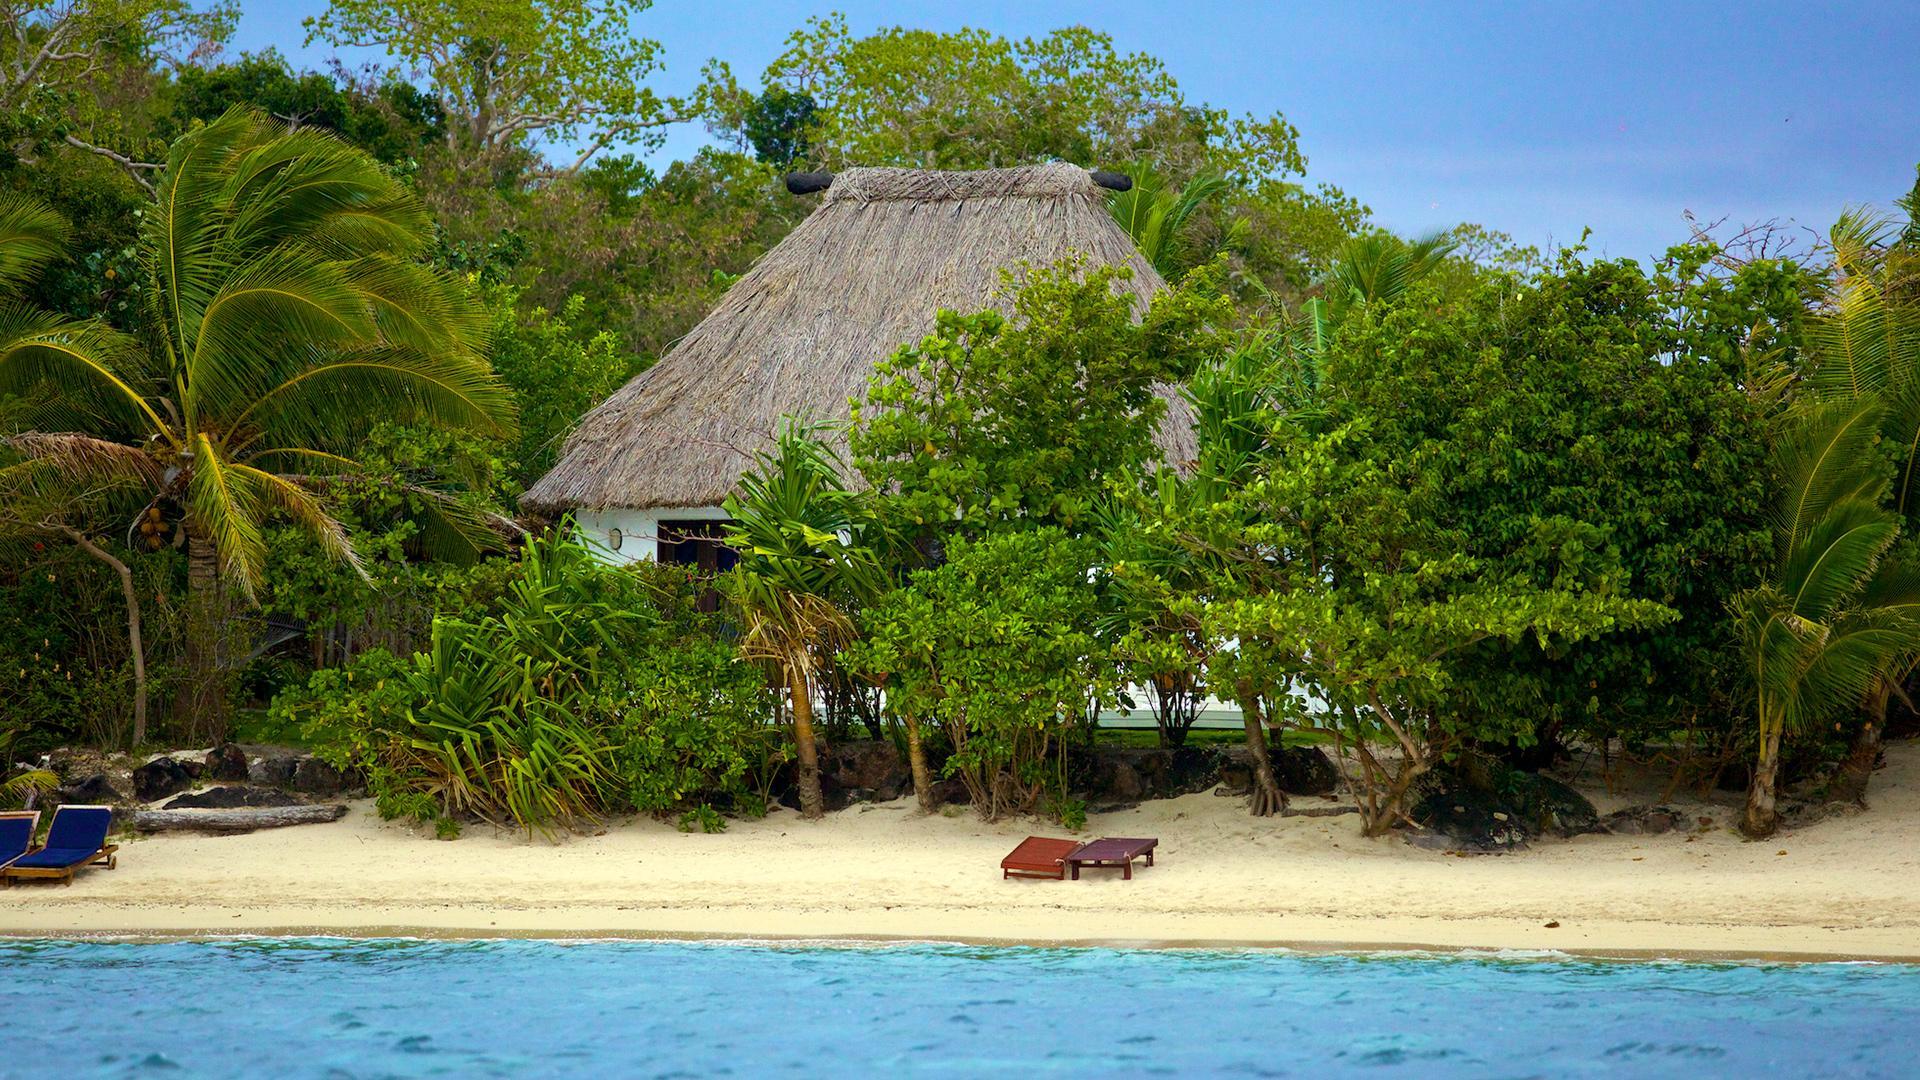 Grand Bure image 1 at Navutu Stars Resort by null, null, Fiji